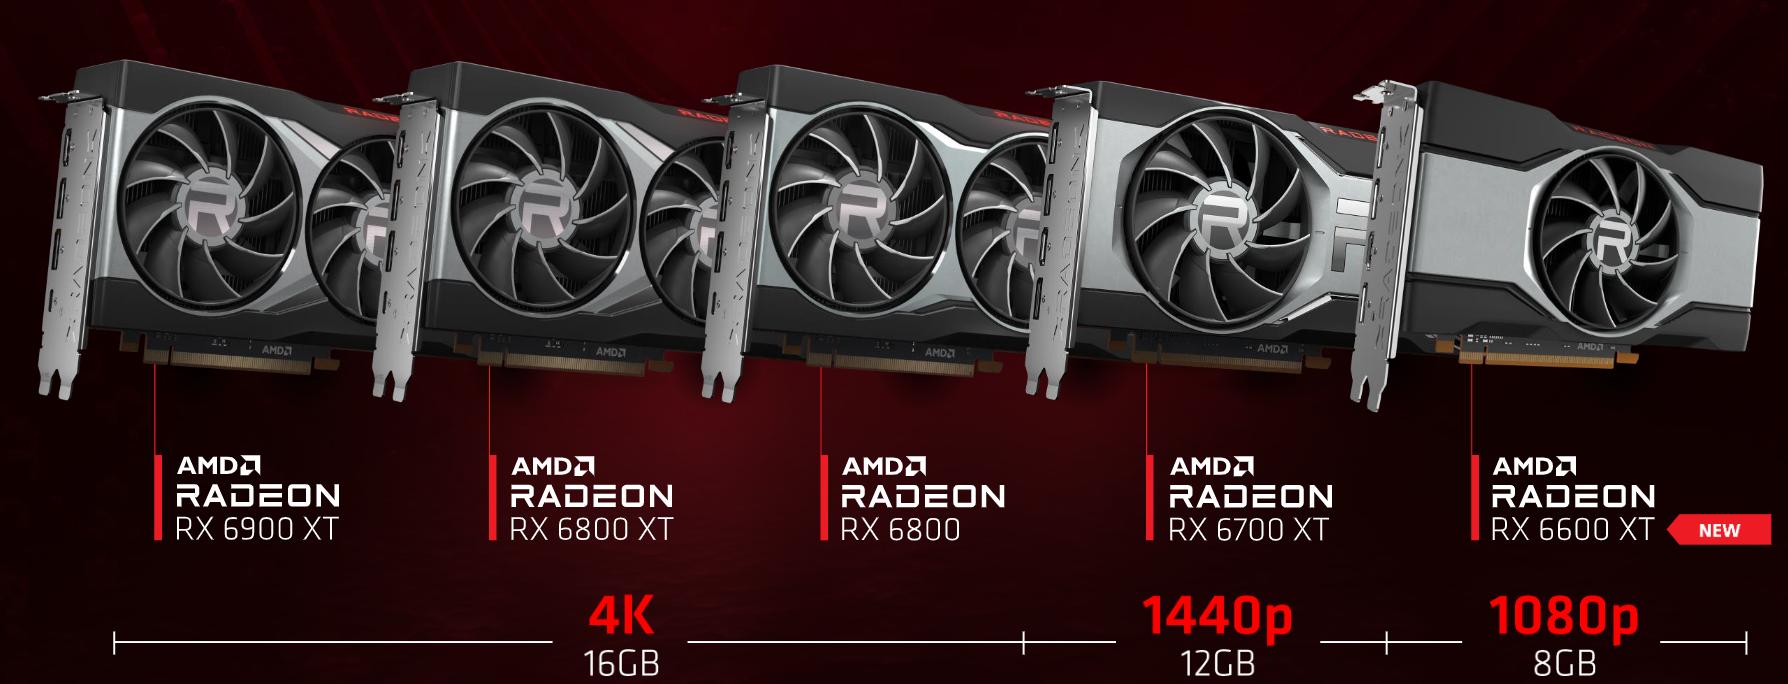 AMD Radeon 600 XT